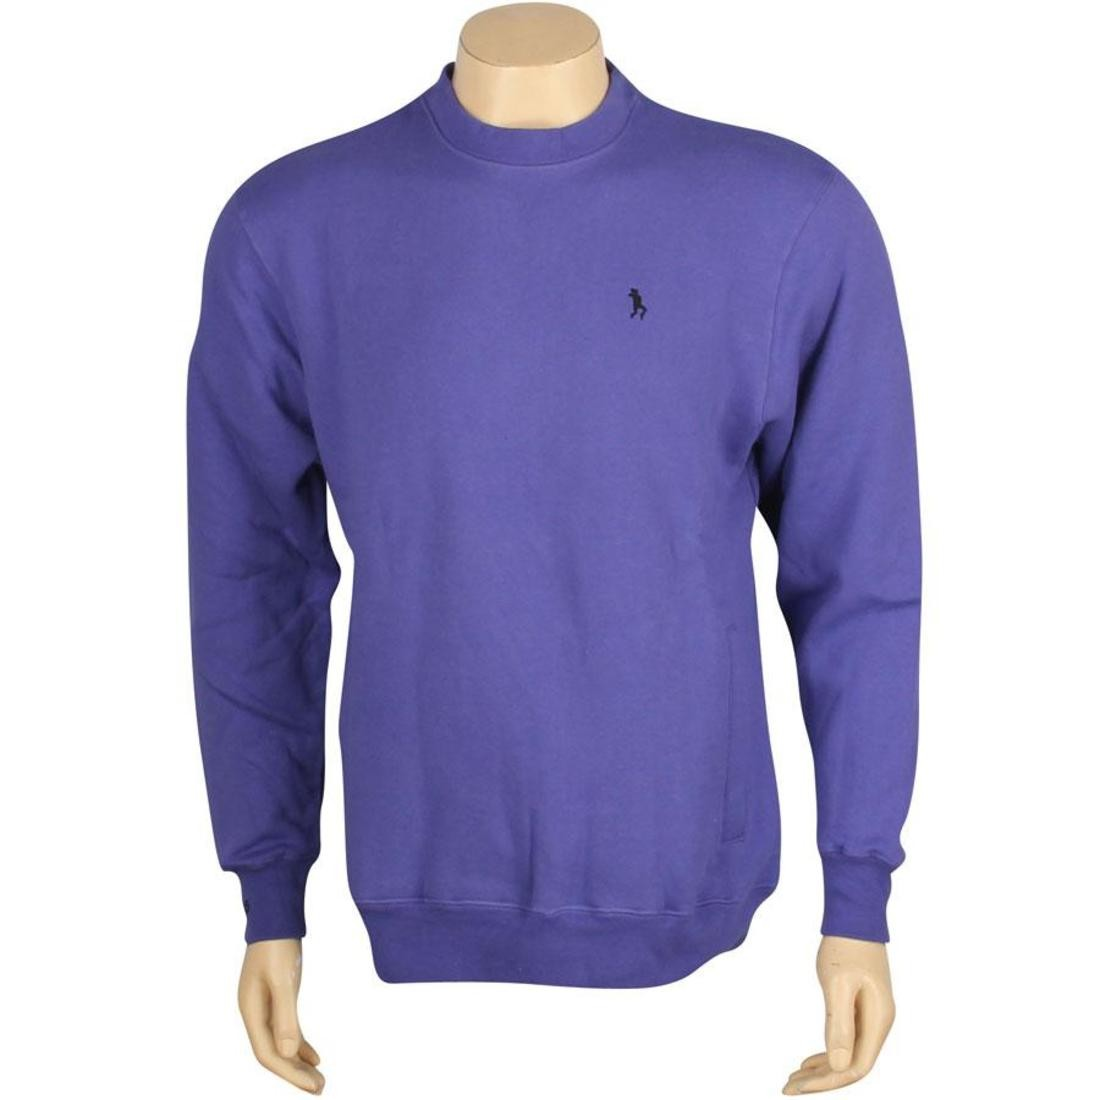 SNEAKTIP ゲーム メンズファッション トップス Tシャツ カットソー メンズ 【 Hate The Game Crewneck (purple) 】 Purple